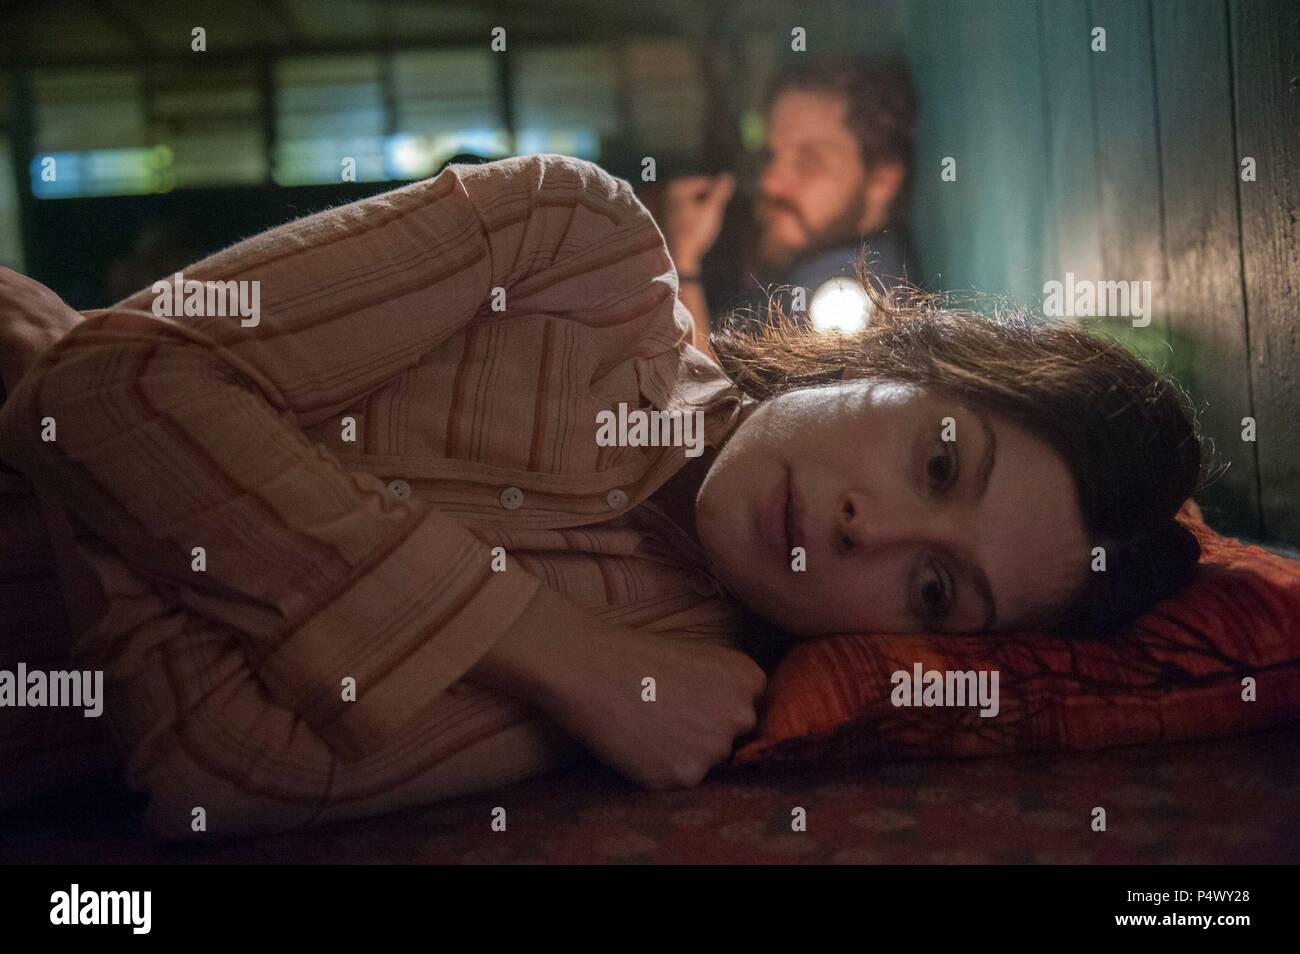 Original Film Title: ENTEBBE.  English Title: ENTEBBE.  Film Director: JOSE PADILLA.  Year: 2018.  Stars: ROSAMUND PIKE. Credit: PARTICIPANT MEDIA/PELLIKOLA / DANIEL, LIAM / Album - Stock Image